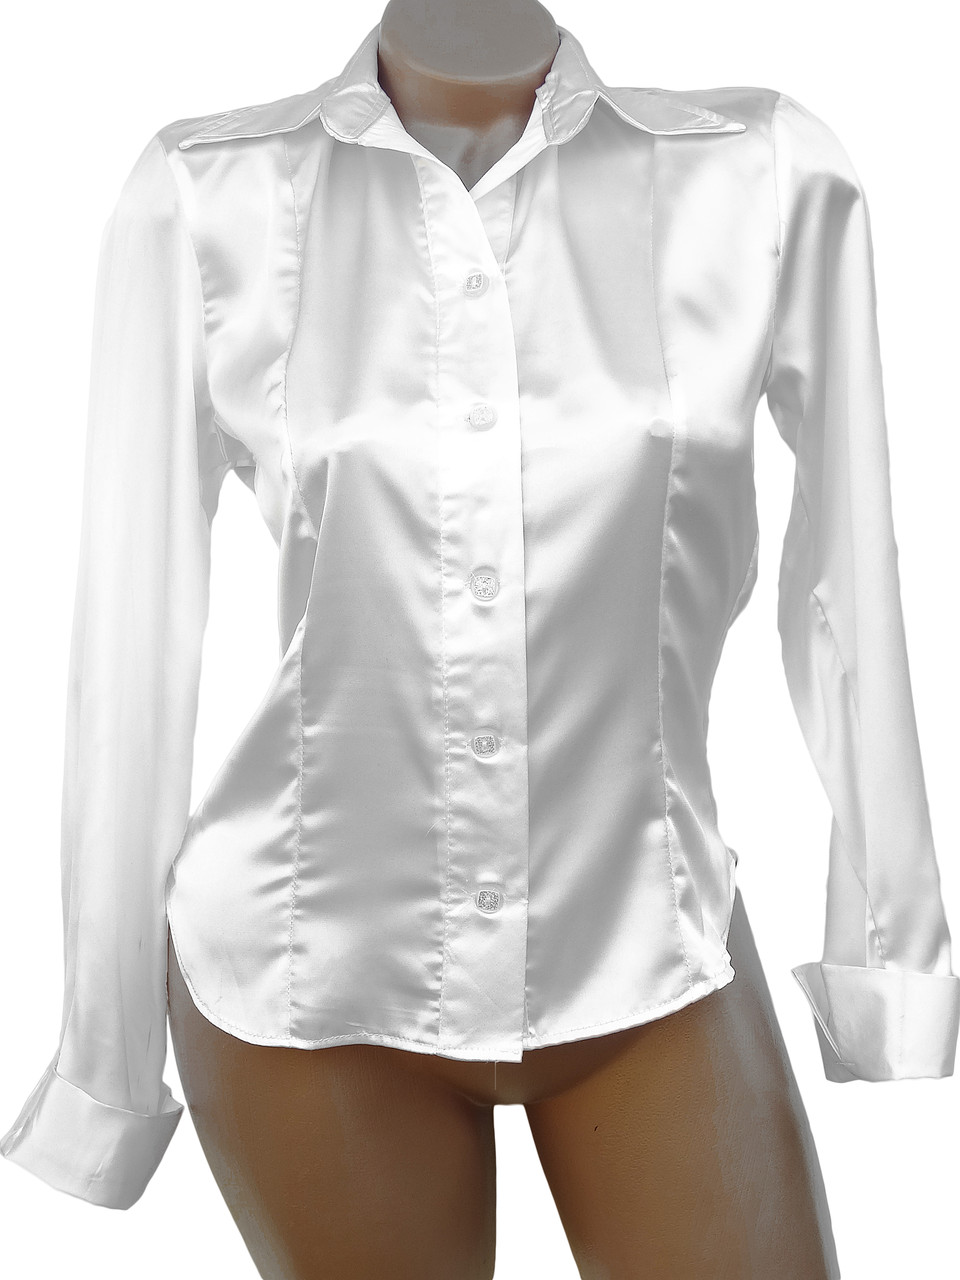 a795d5333d3a322 Женская атласная рубашка (48,50) - Женская одежда оптом, женская одежда  больших